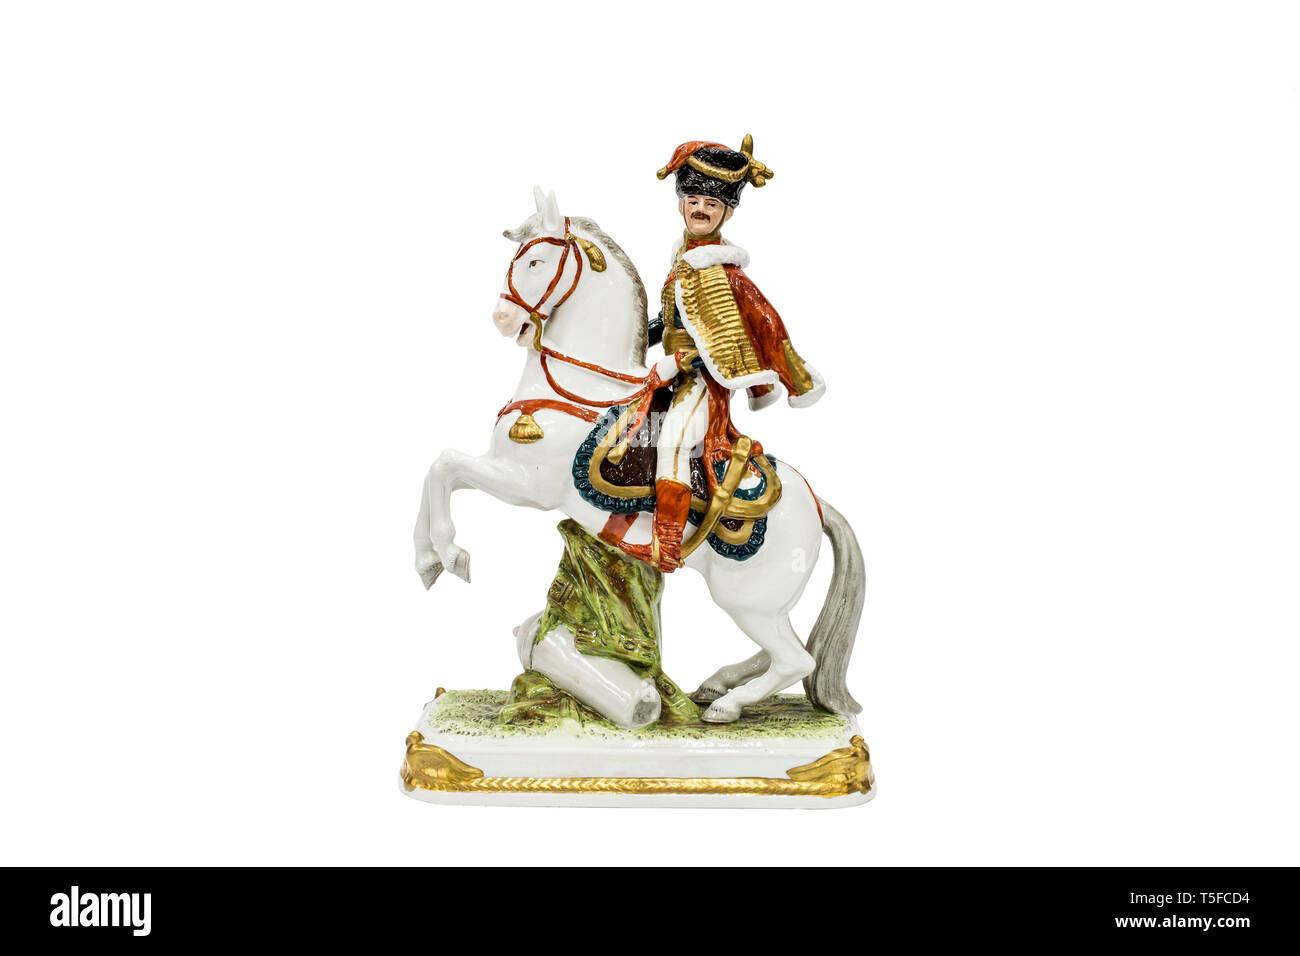 Porcelain figurines of Eugène Rose de Beauharnais, one from commanders of Napoleon Bonaparte - Stock Image